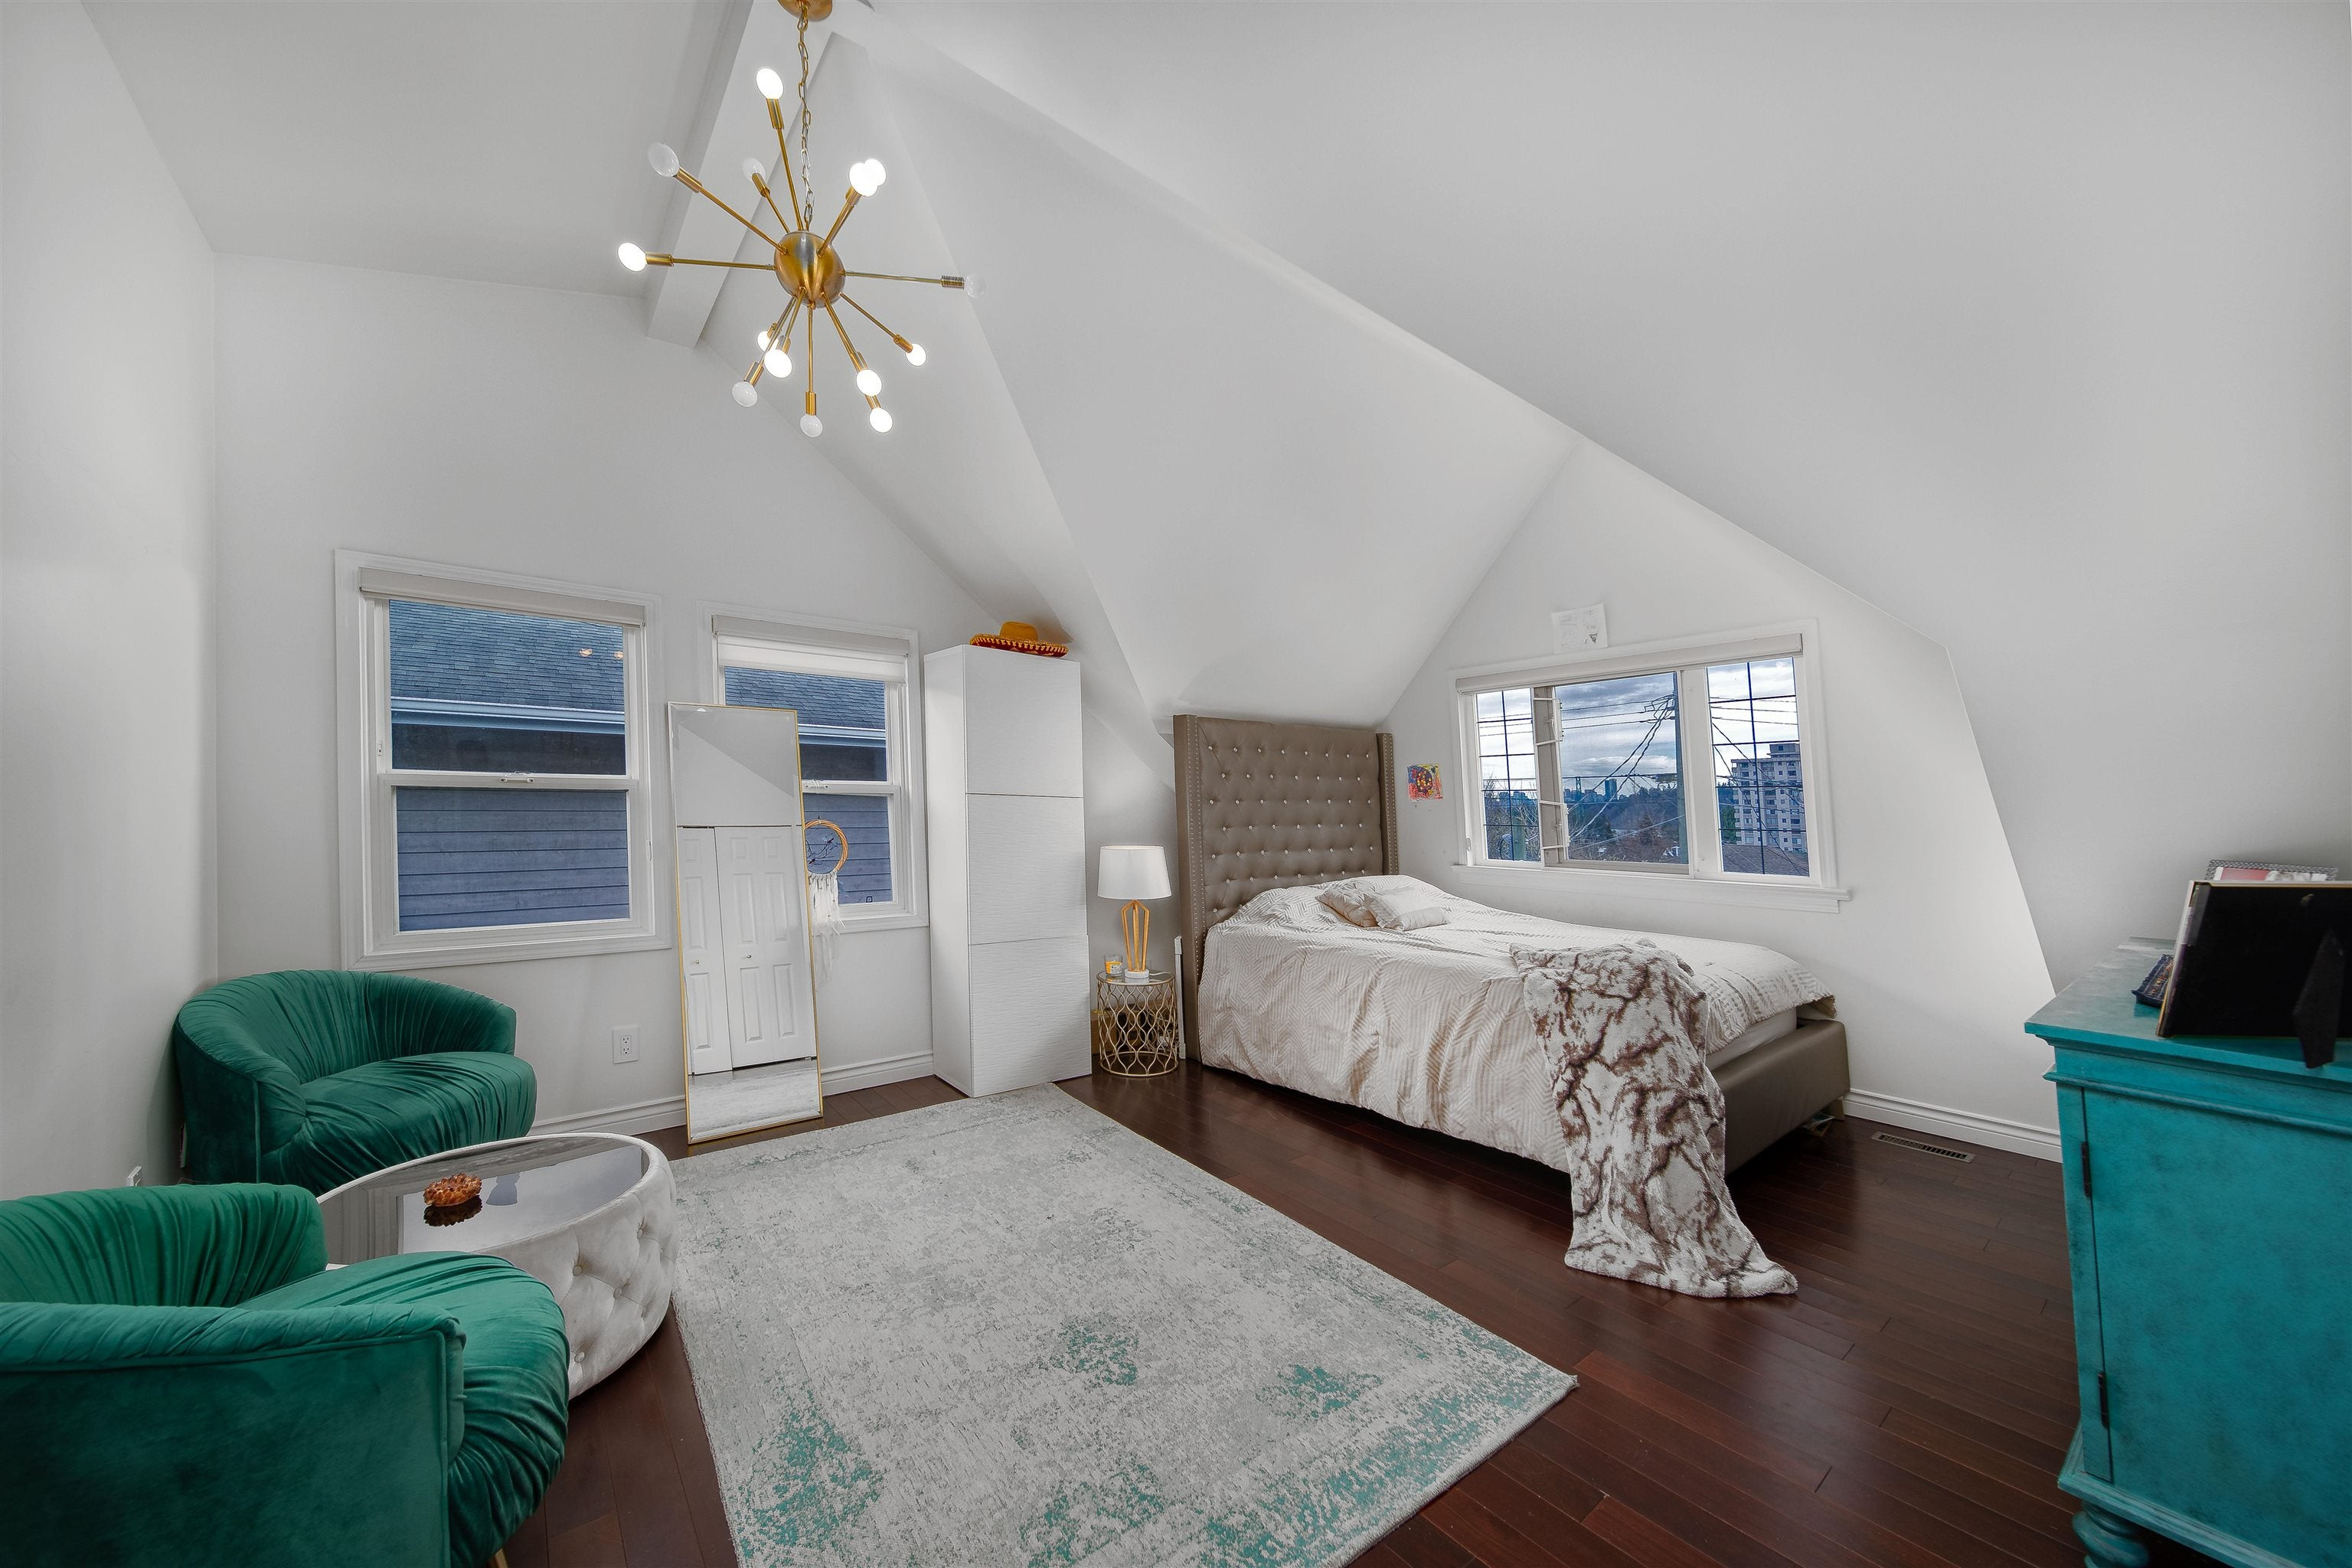 1357 FULTON AVENUE - Ambleside House/Single Family for sale, 6 Bedrooms (R2617731) - #17